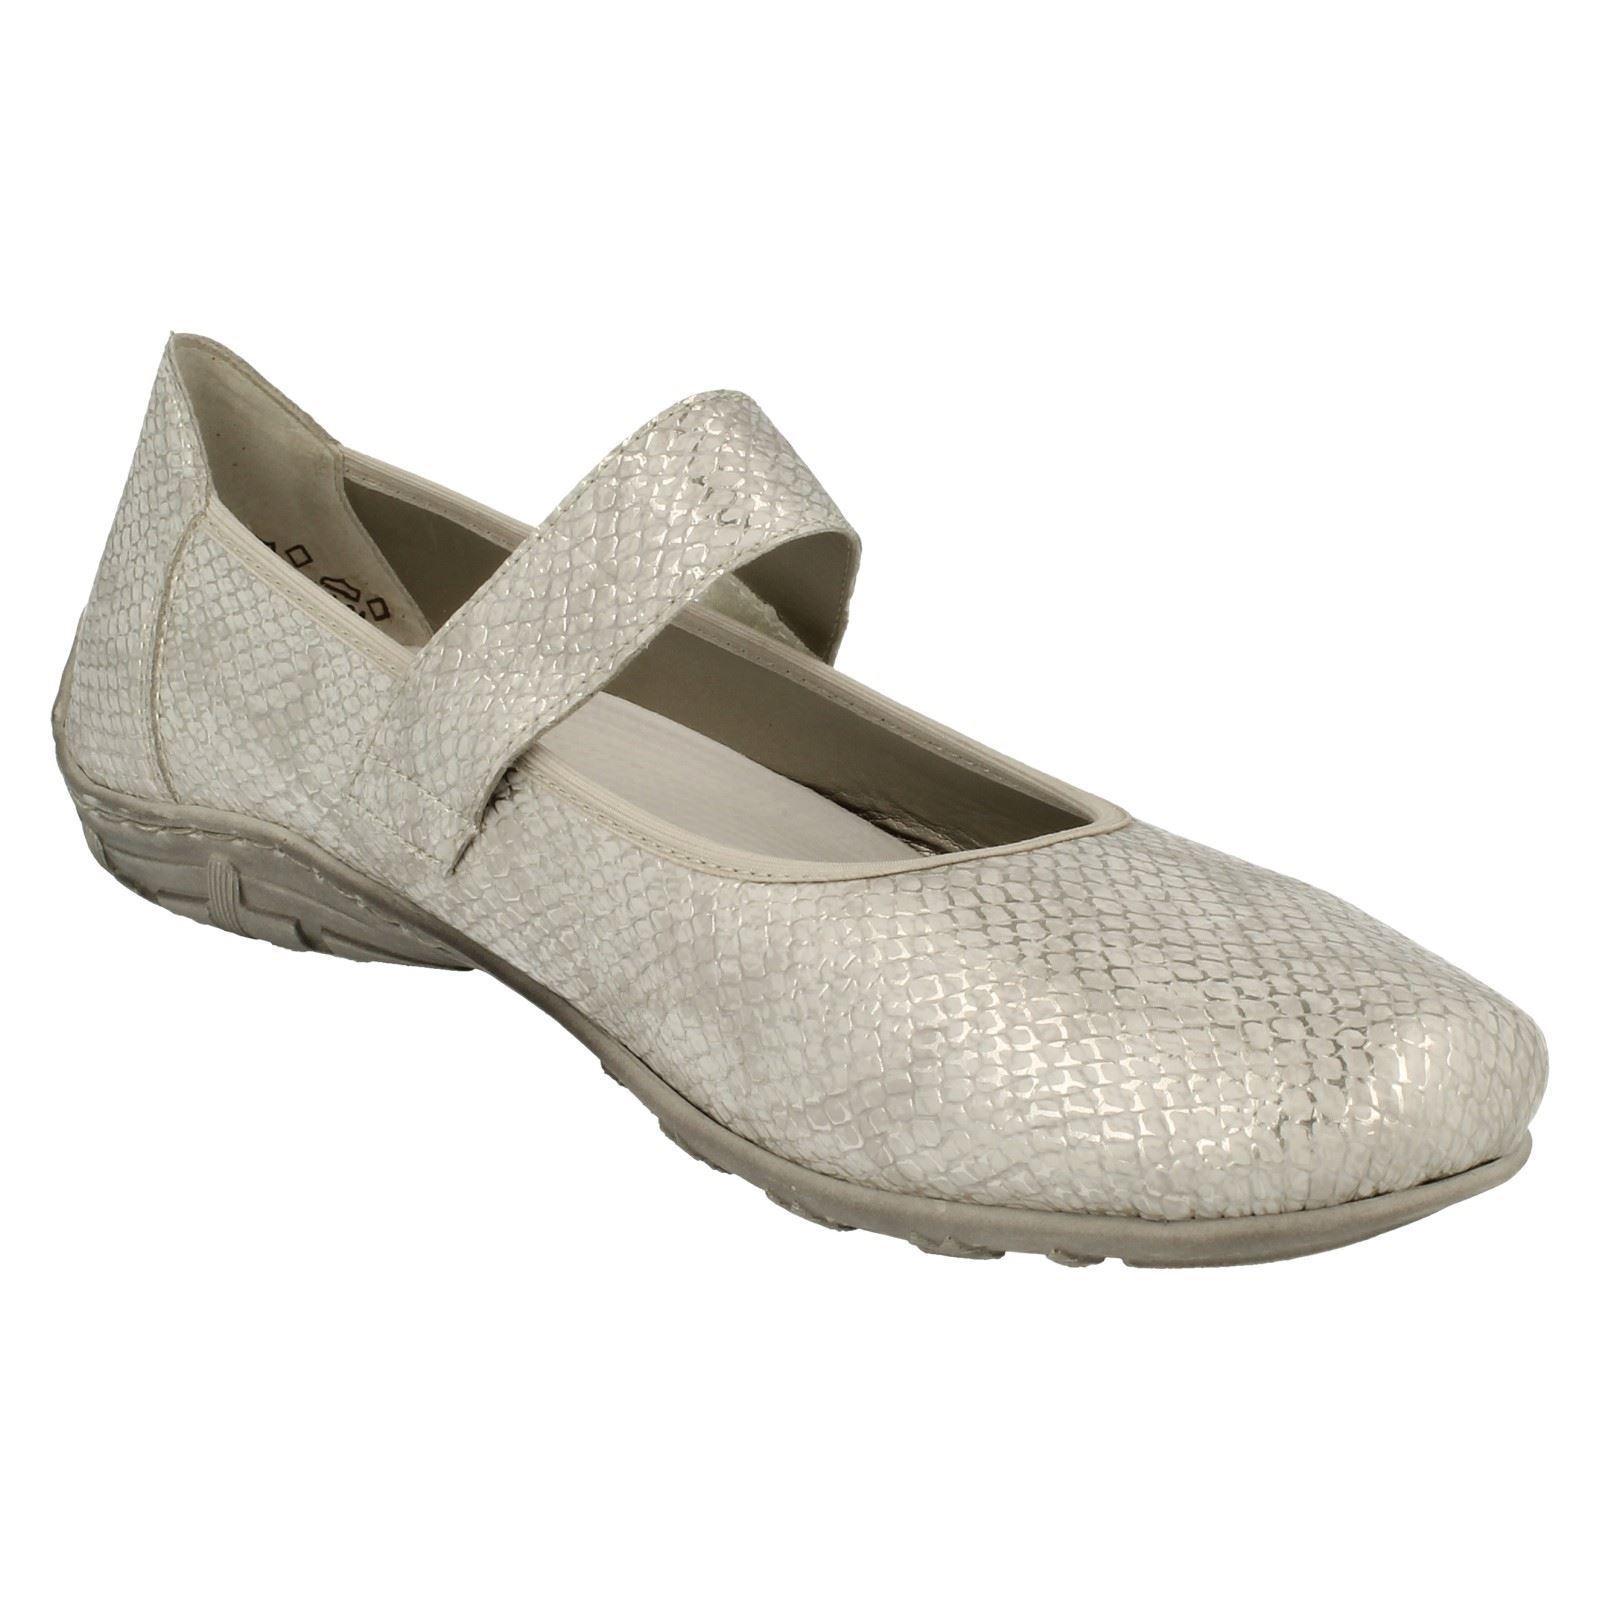 Onorevoli Rieker Stile-L2062 Mary Jane Ballerine Stile-L2062 Rieker 9acfb1